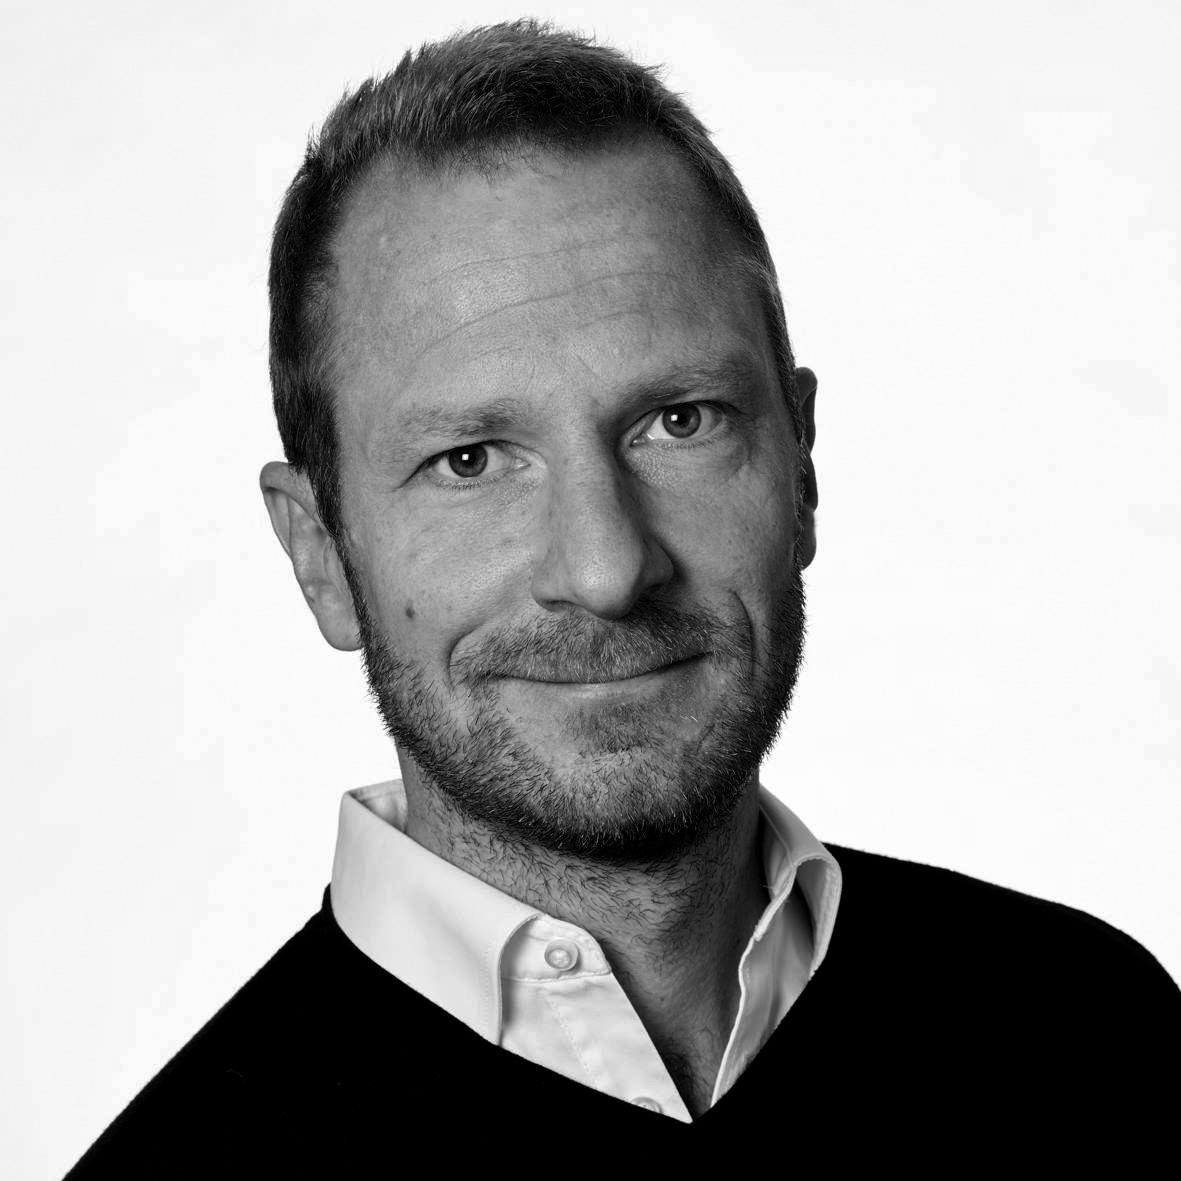 Niklas Olsen